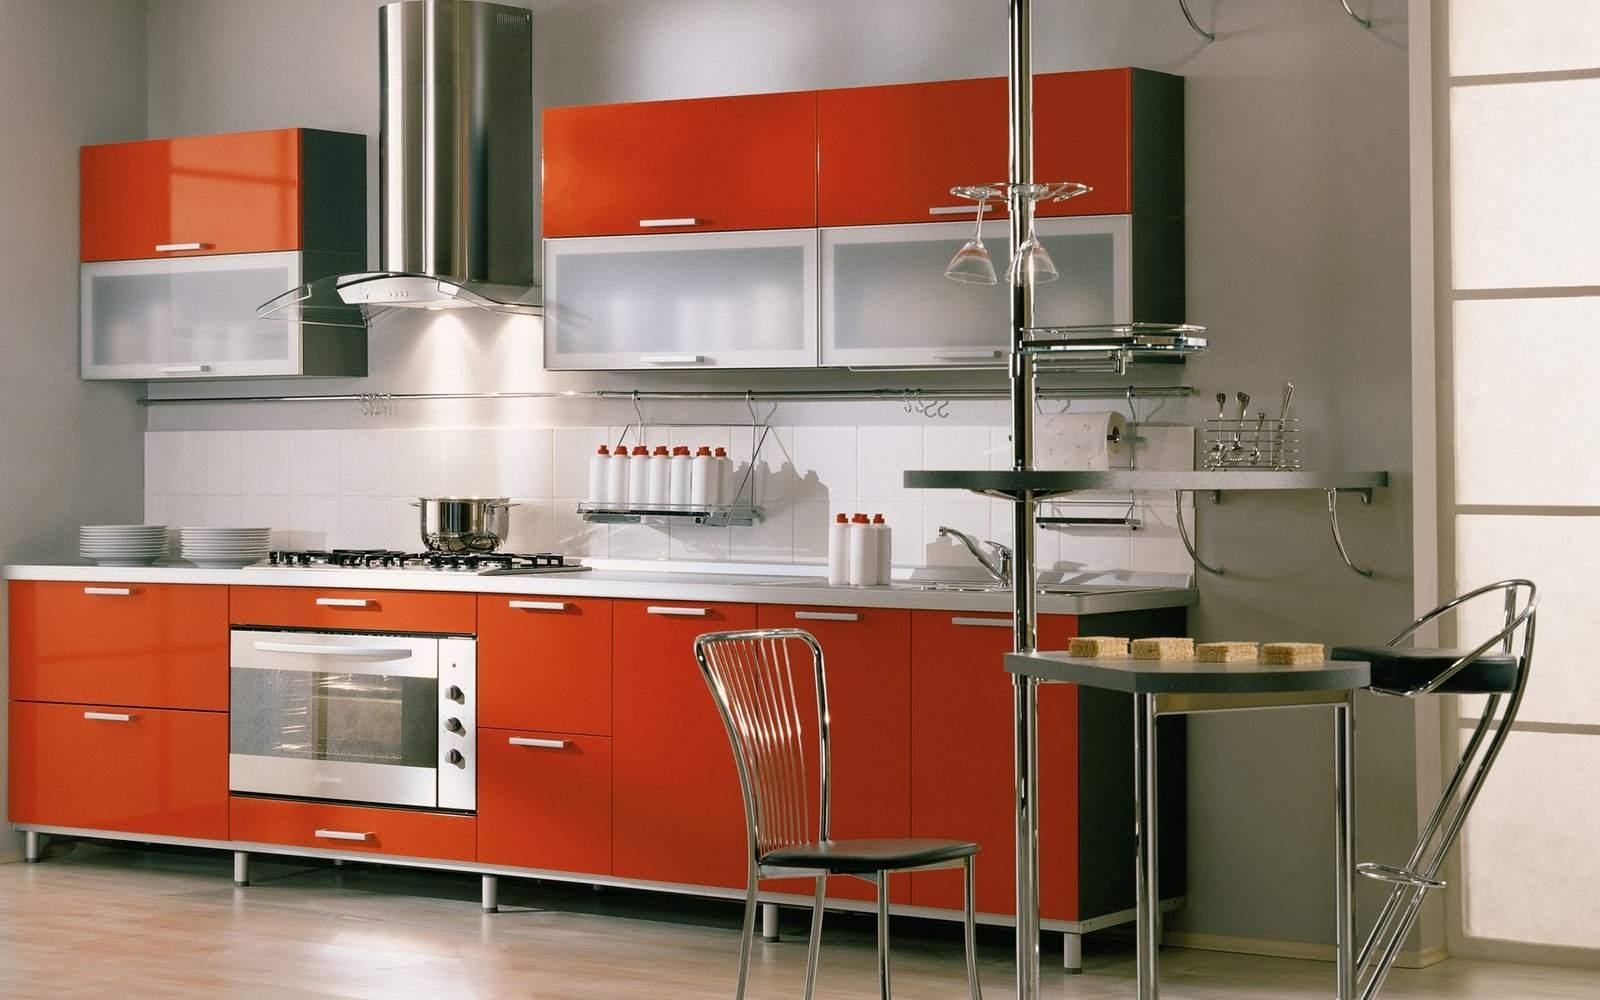 Upscale Your Kitchen With 5 Stylish Kitchen Cabinet Upgrades